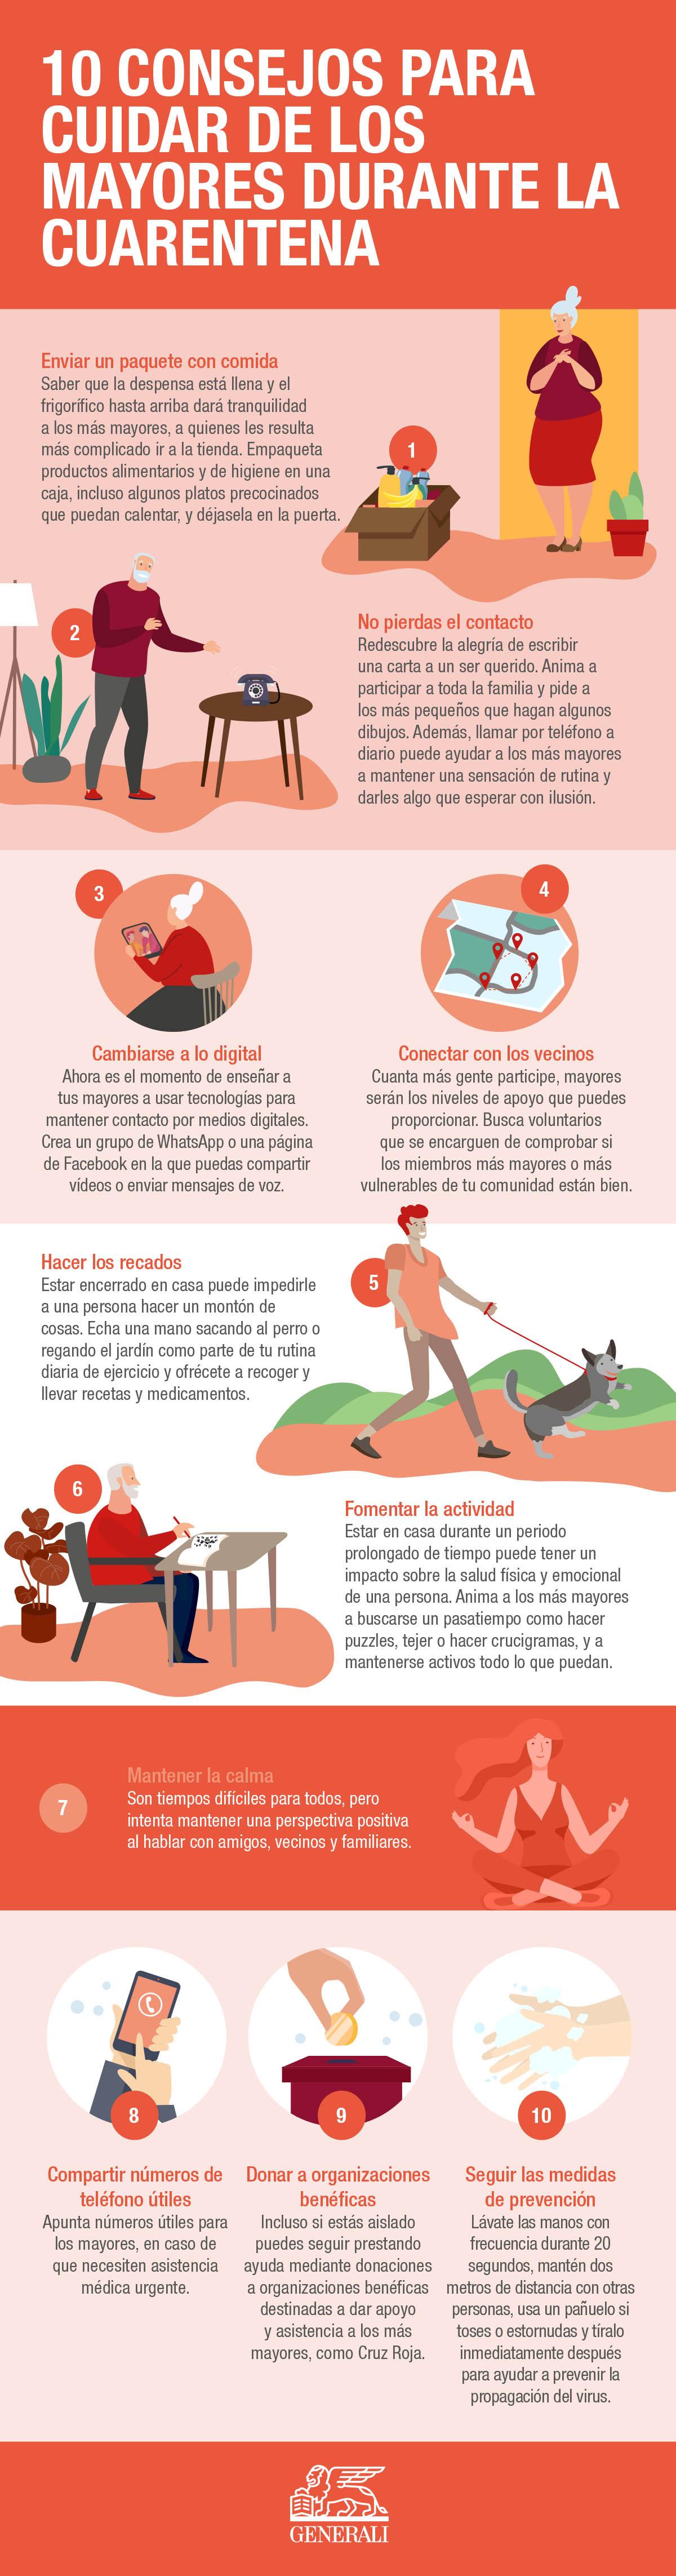 Coronavirus_Care_for_the_Elderly_Infographic_SPANISH.jpg